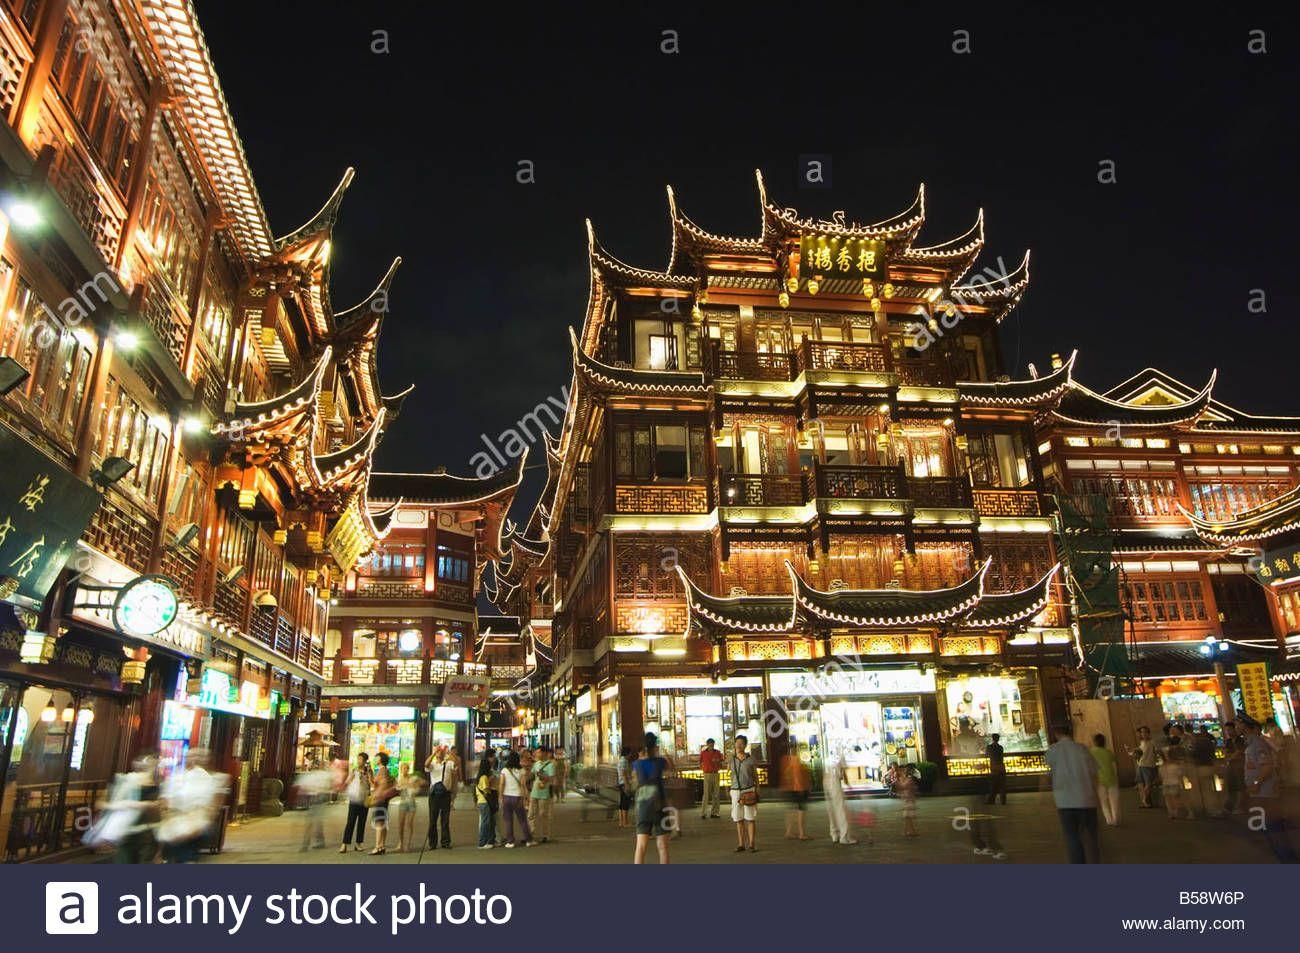 Yuyuan Garden Bazaar https://www.lonelyplanet.com/china/shanghai ...